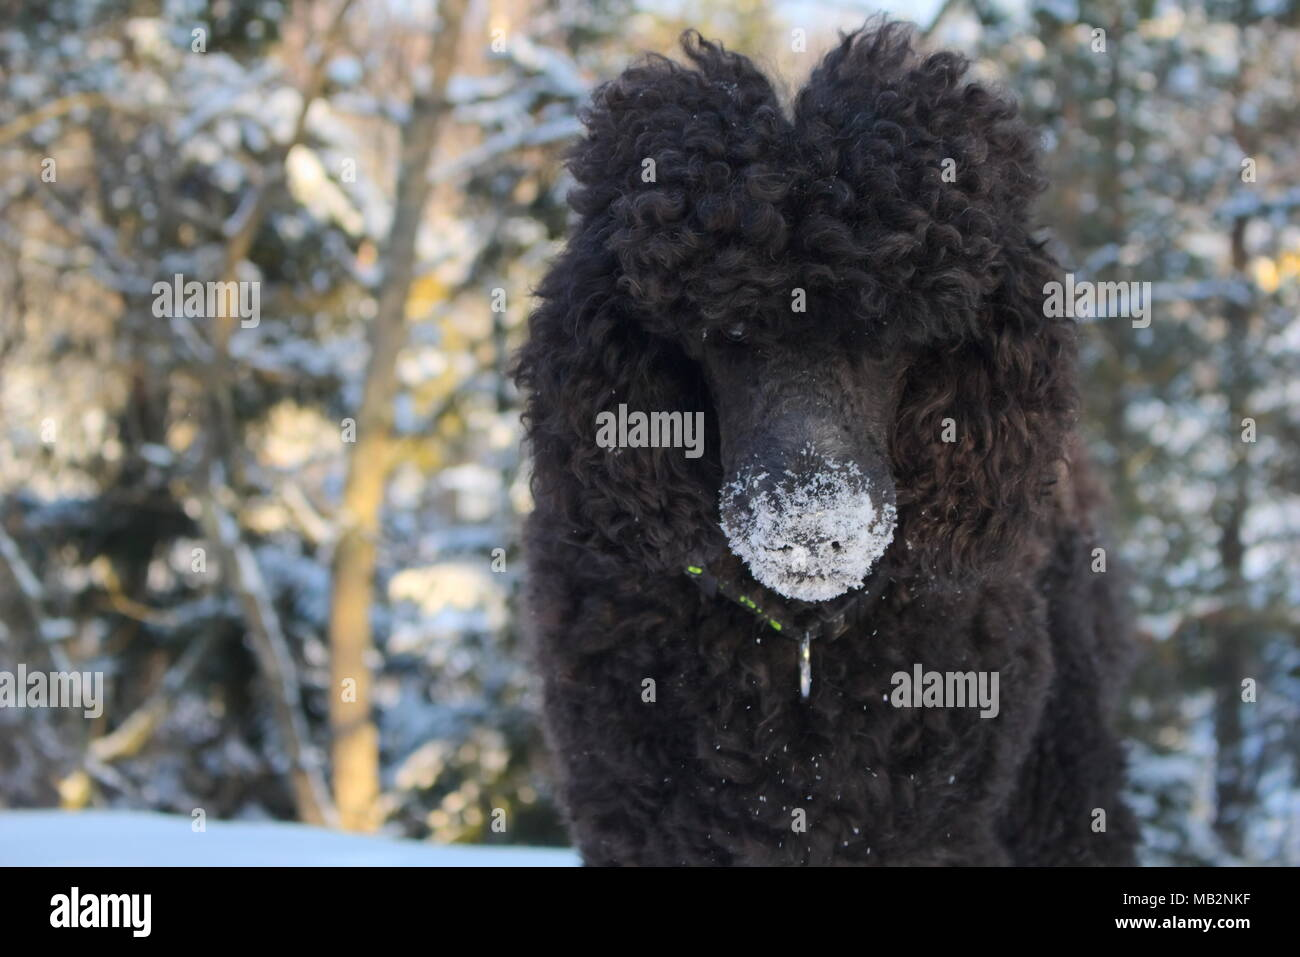 Mischievous Poodle - Stock Image